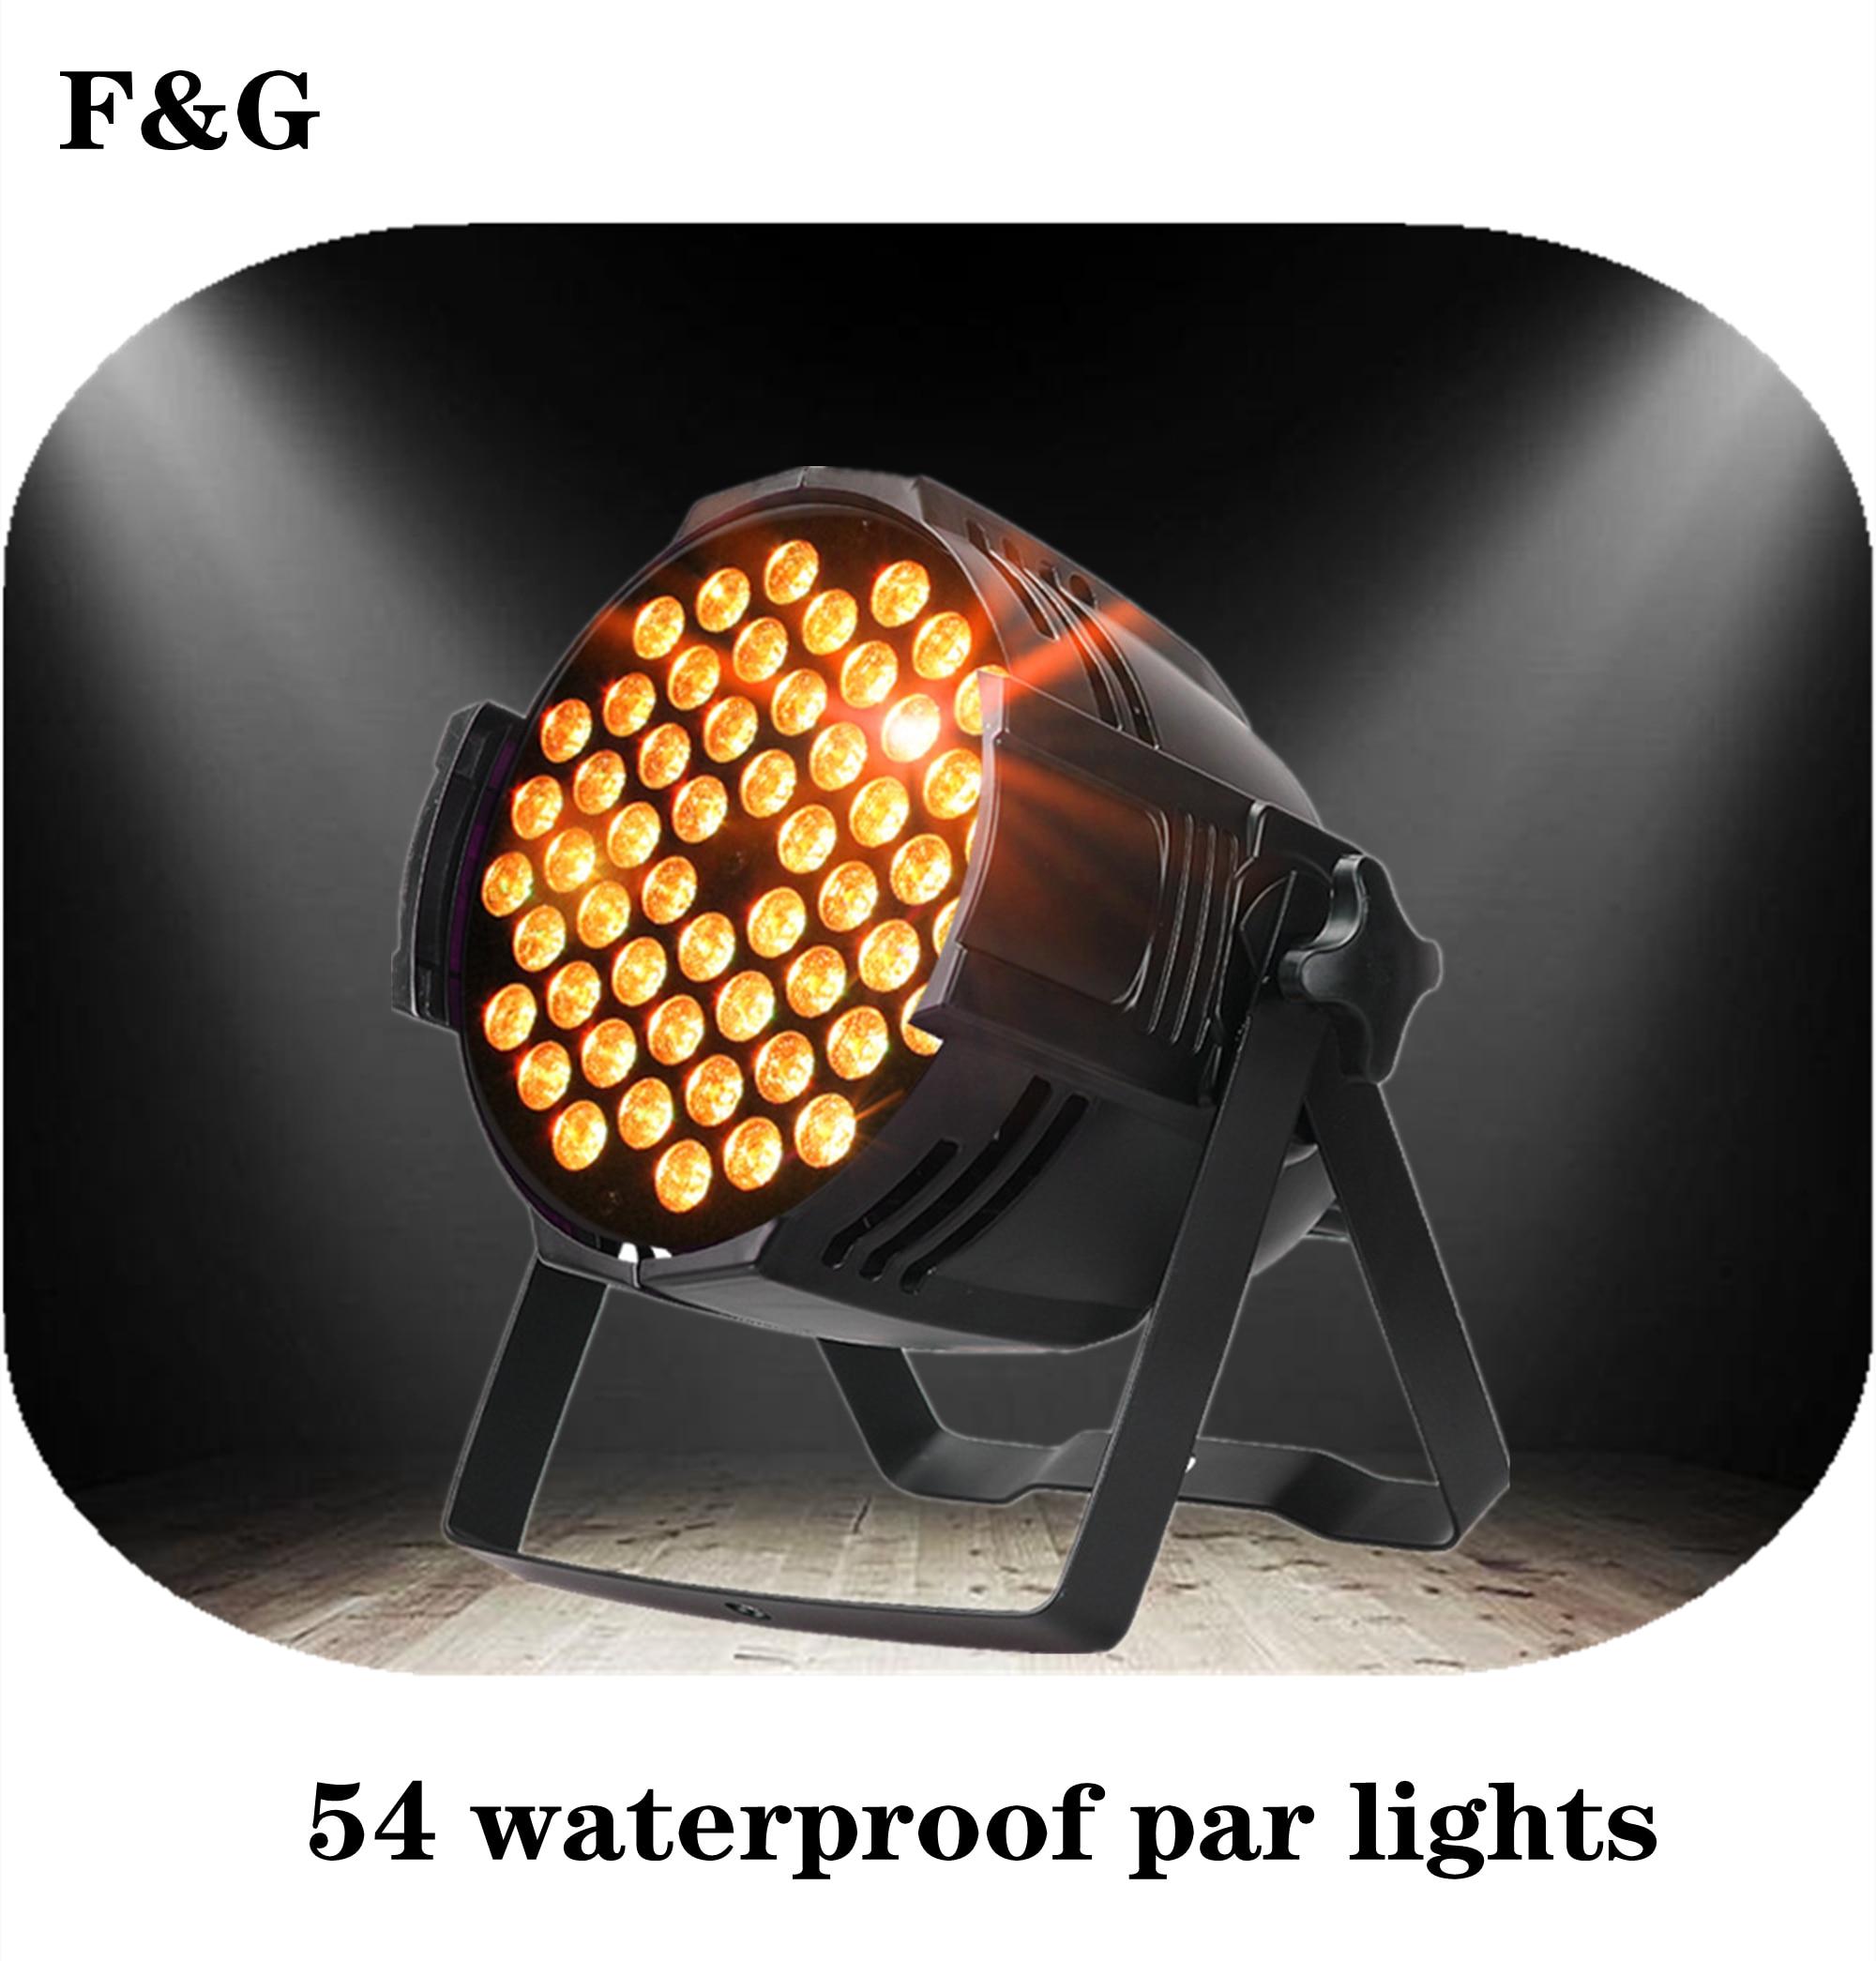 Luz Par LED RGB de aleación de aluminio decoración para Dj discoteca...